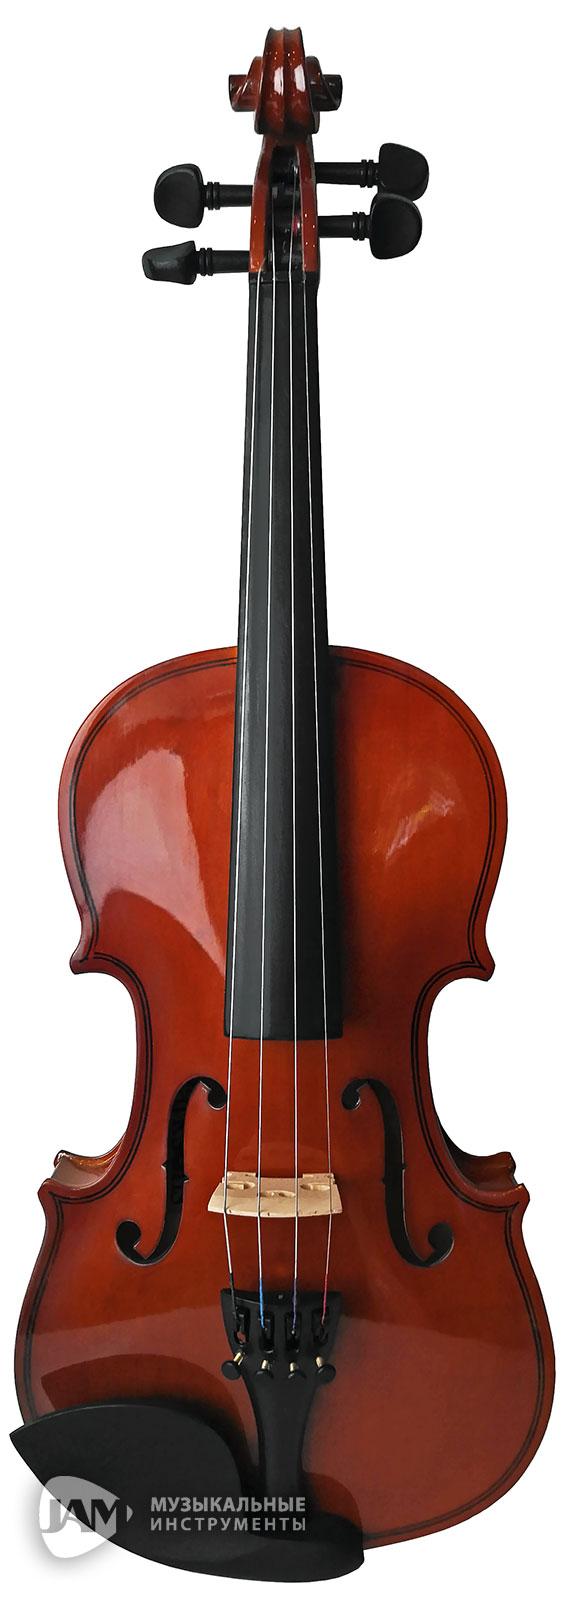 Уменьшенные 1/2 скрипки